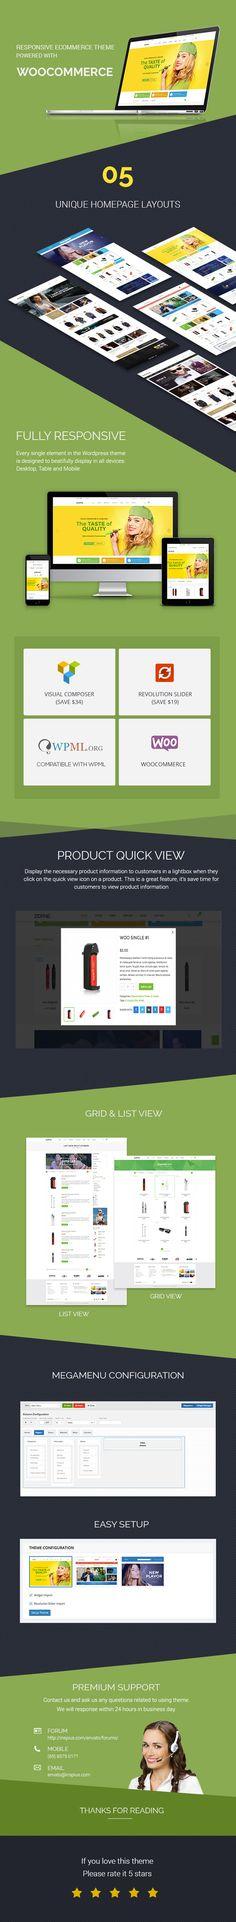 The Retailer - Responsive WordPress Theme | Beautiful y Comercio ...